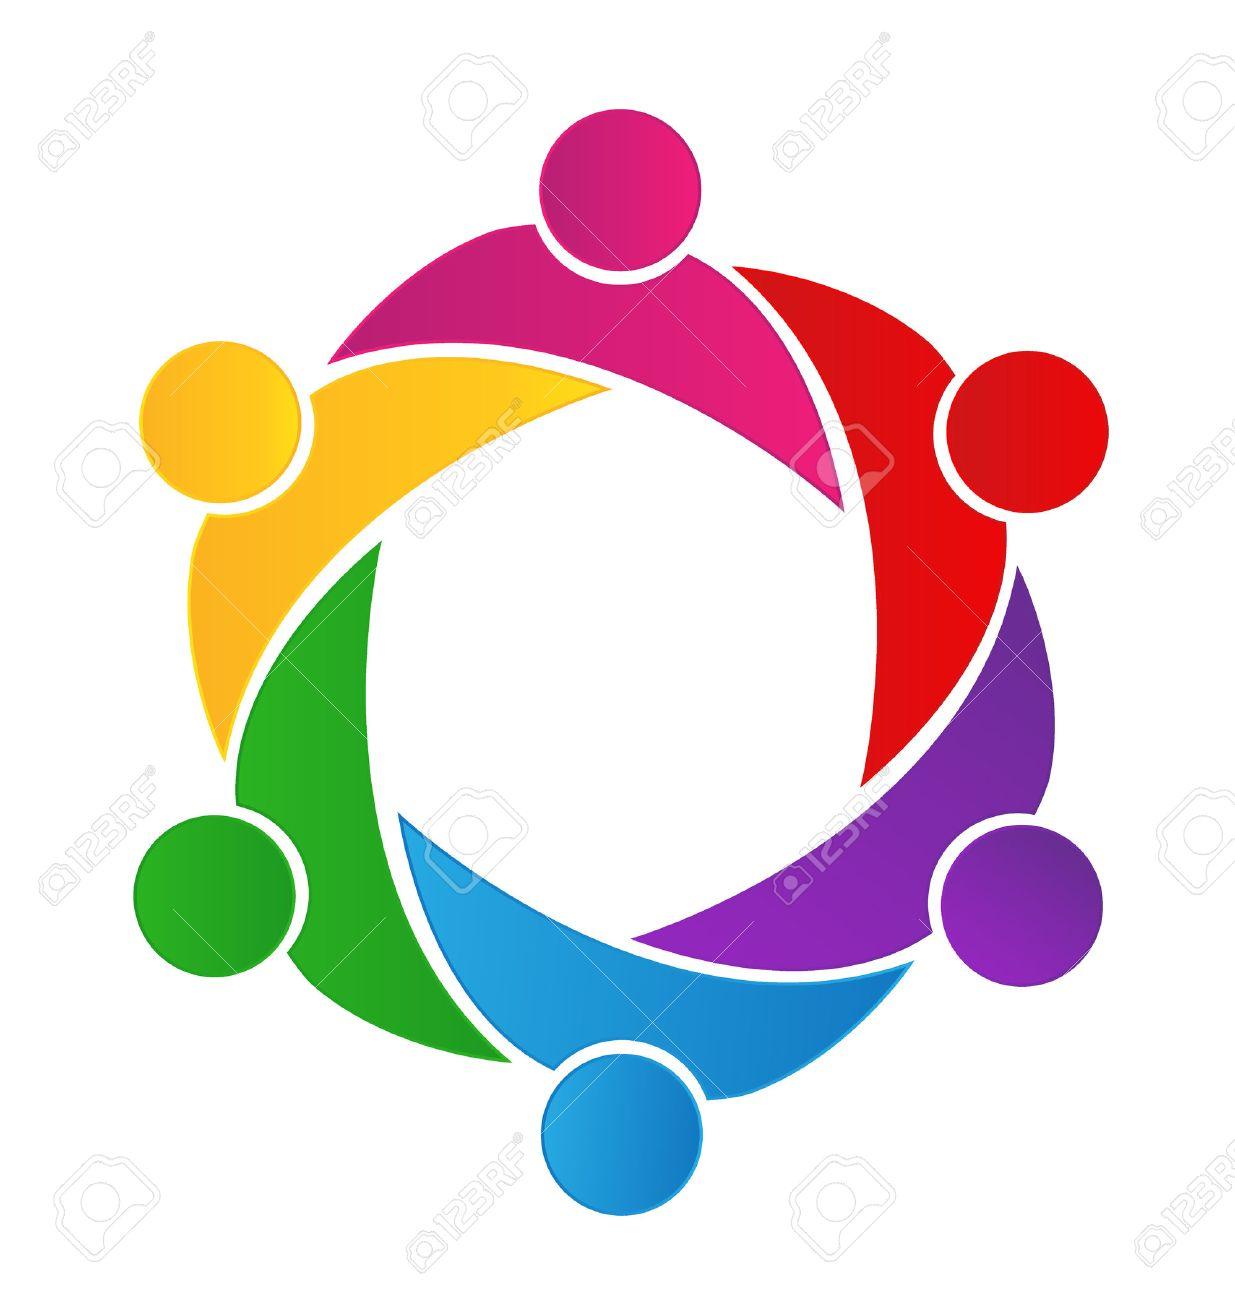 Teamwork business logo. Concept of community union goals solidarity...